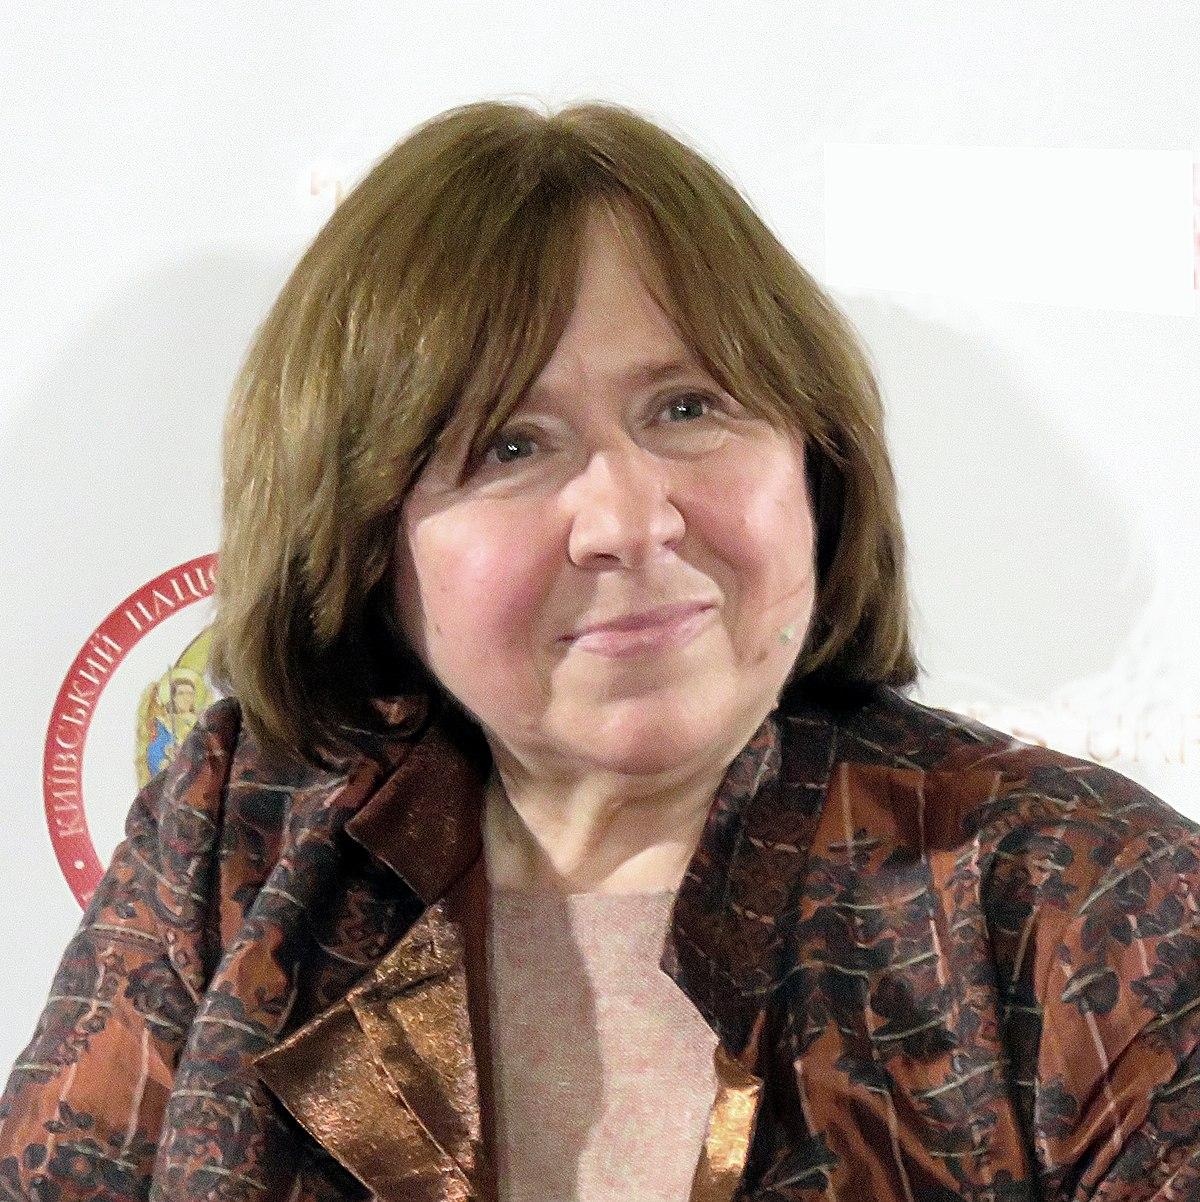 Алексиевич, Светлана Александровна — Википедия